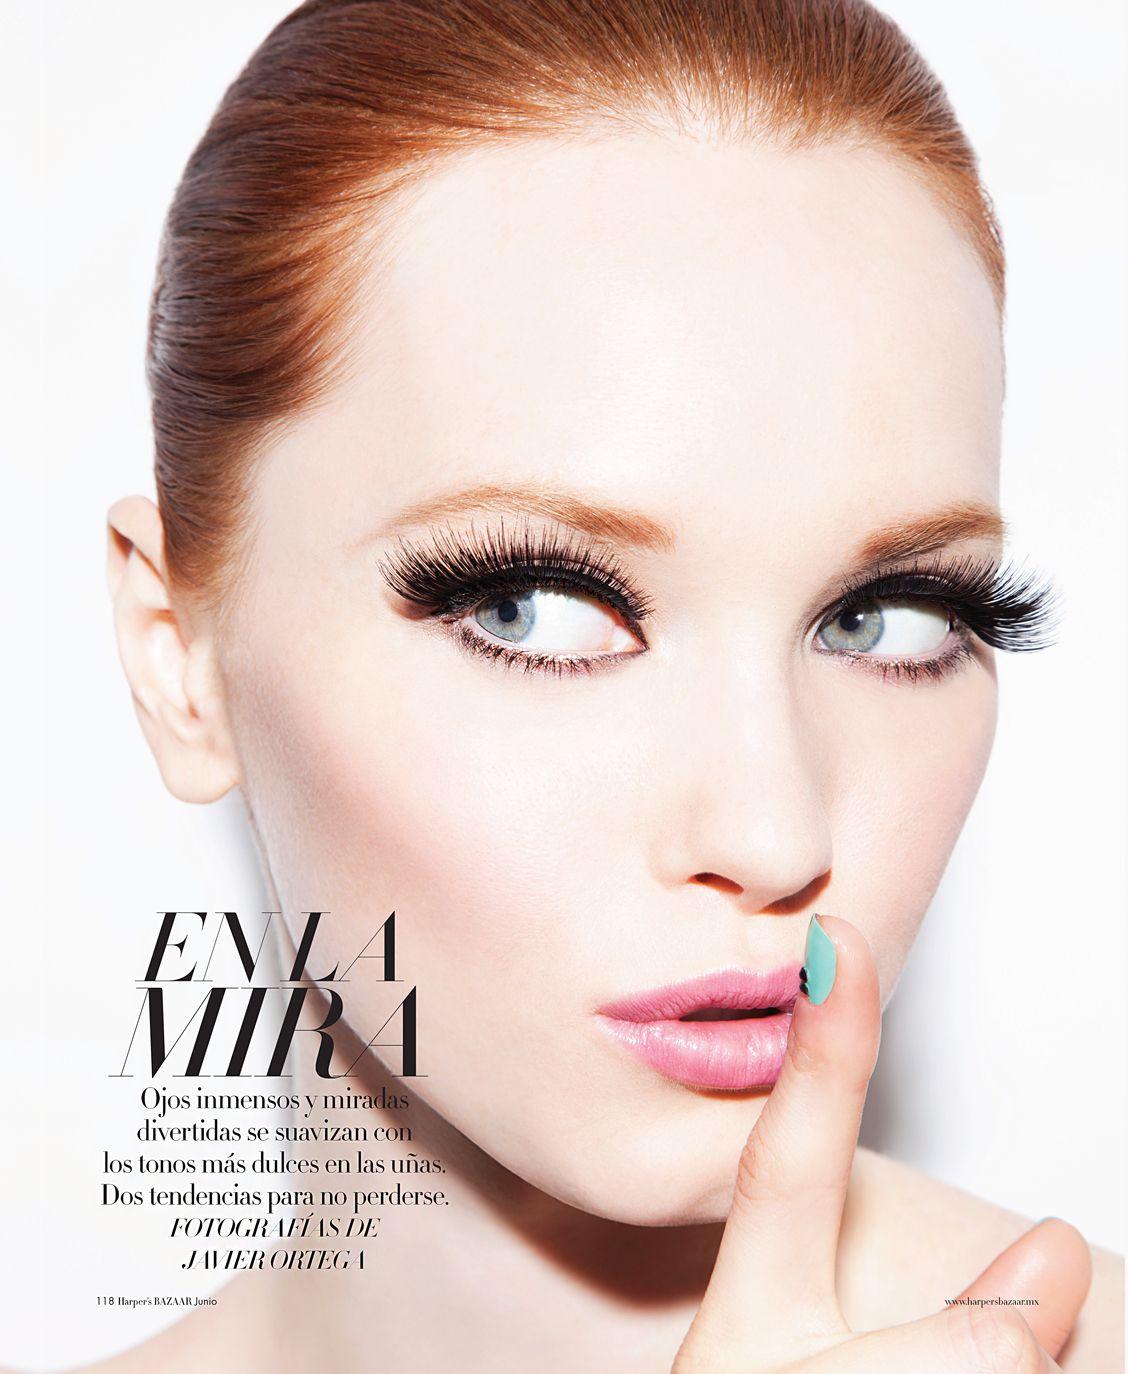 Harper's Bazaar Espanol